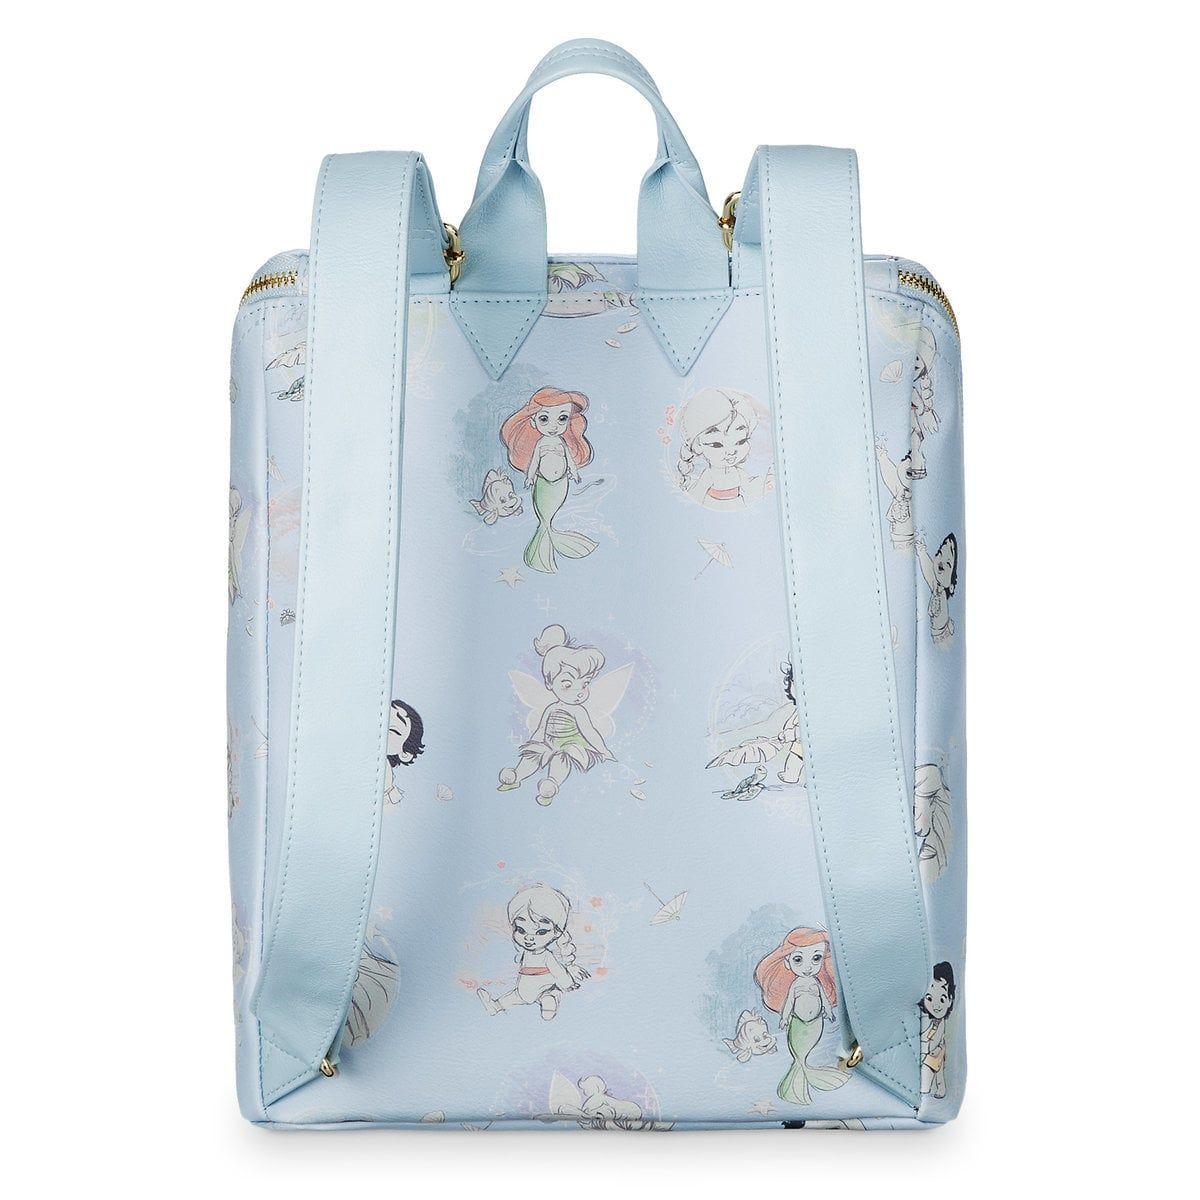 Dream Wish It Do It Quote Blue Watercolour AOP Tote Bag